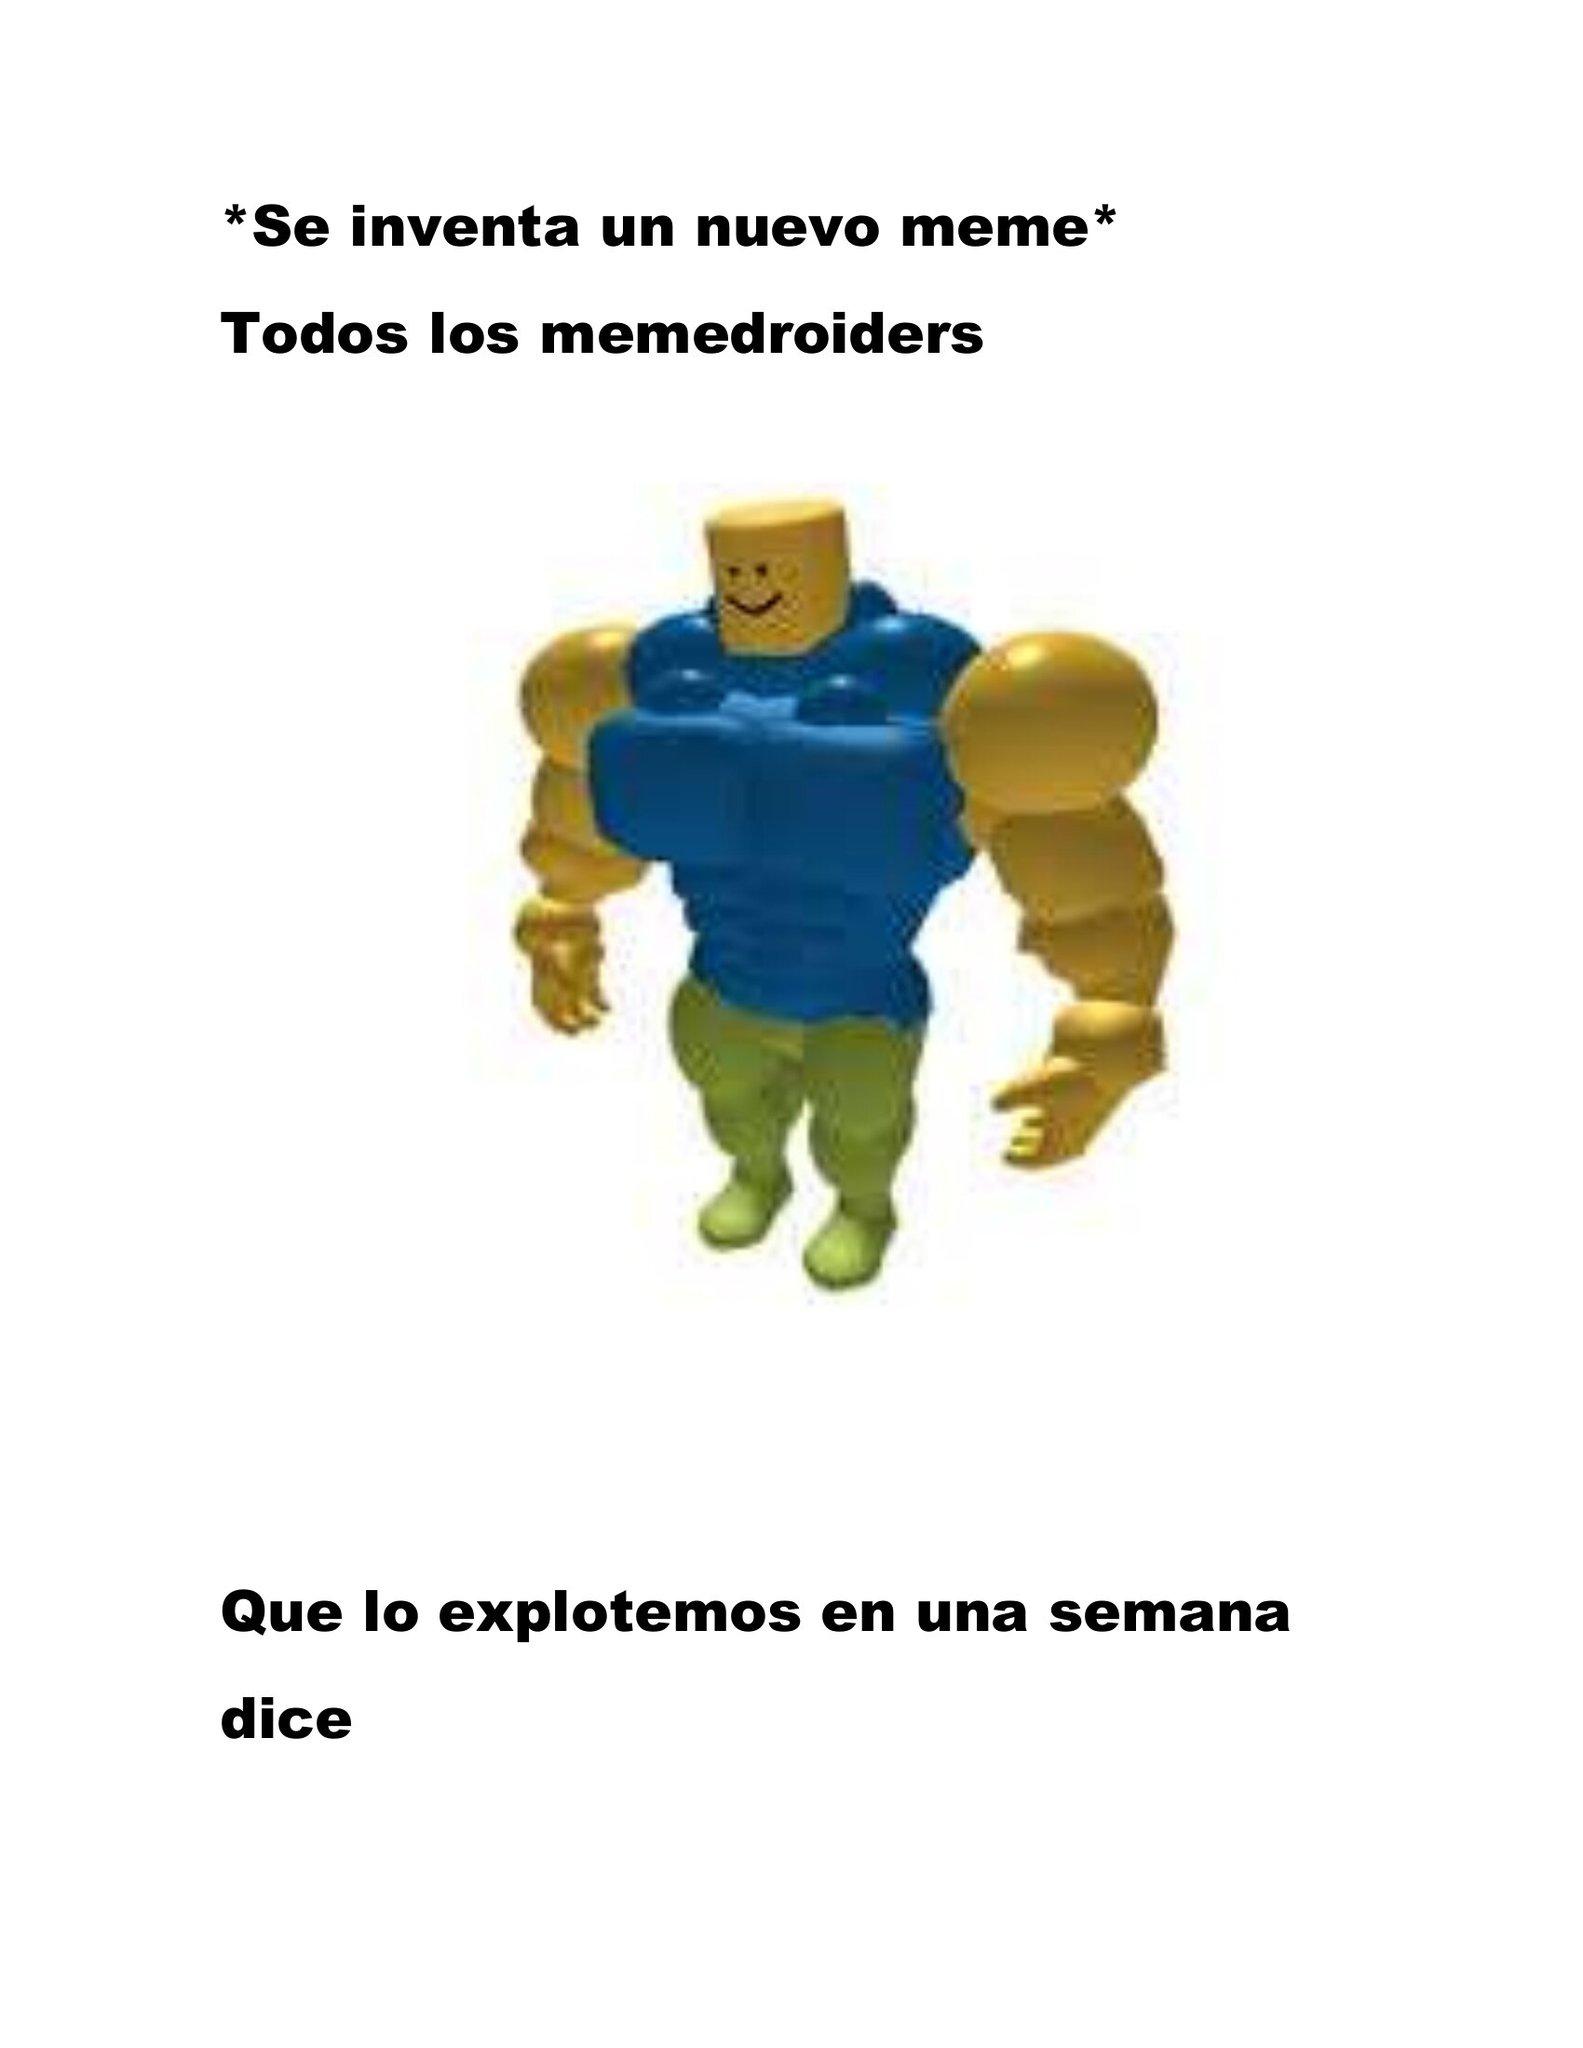 Dice - meme